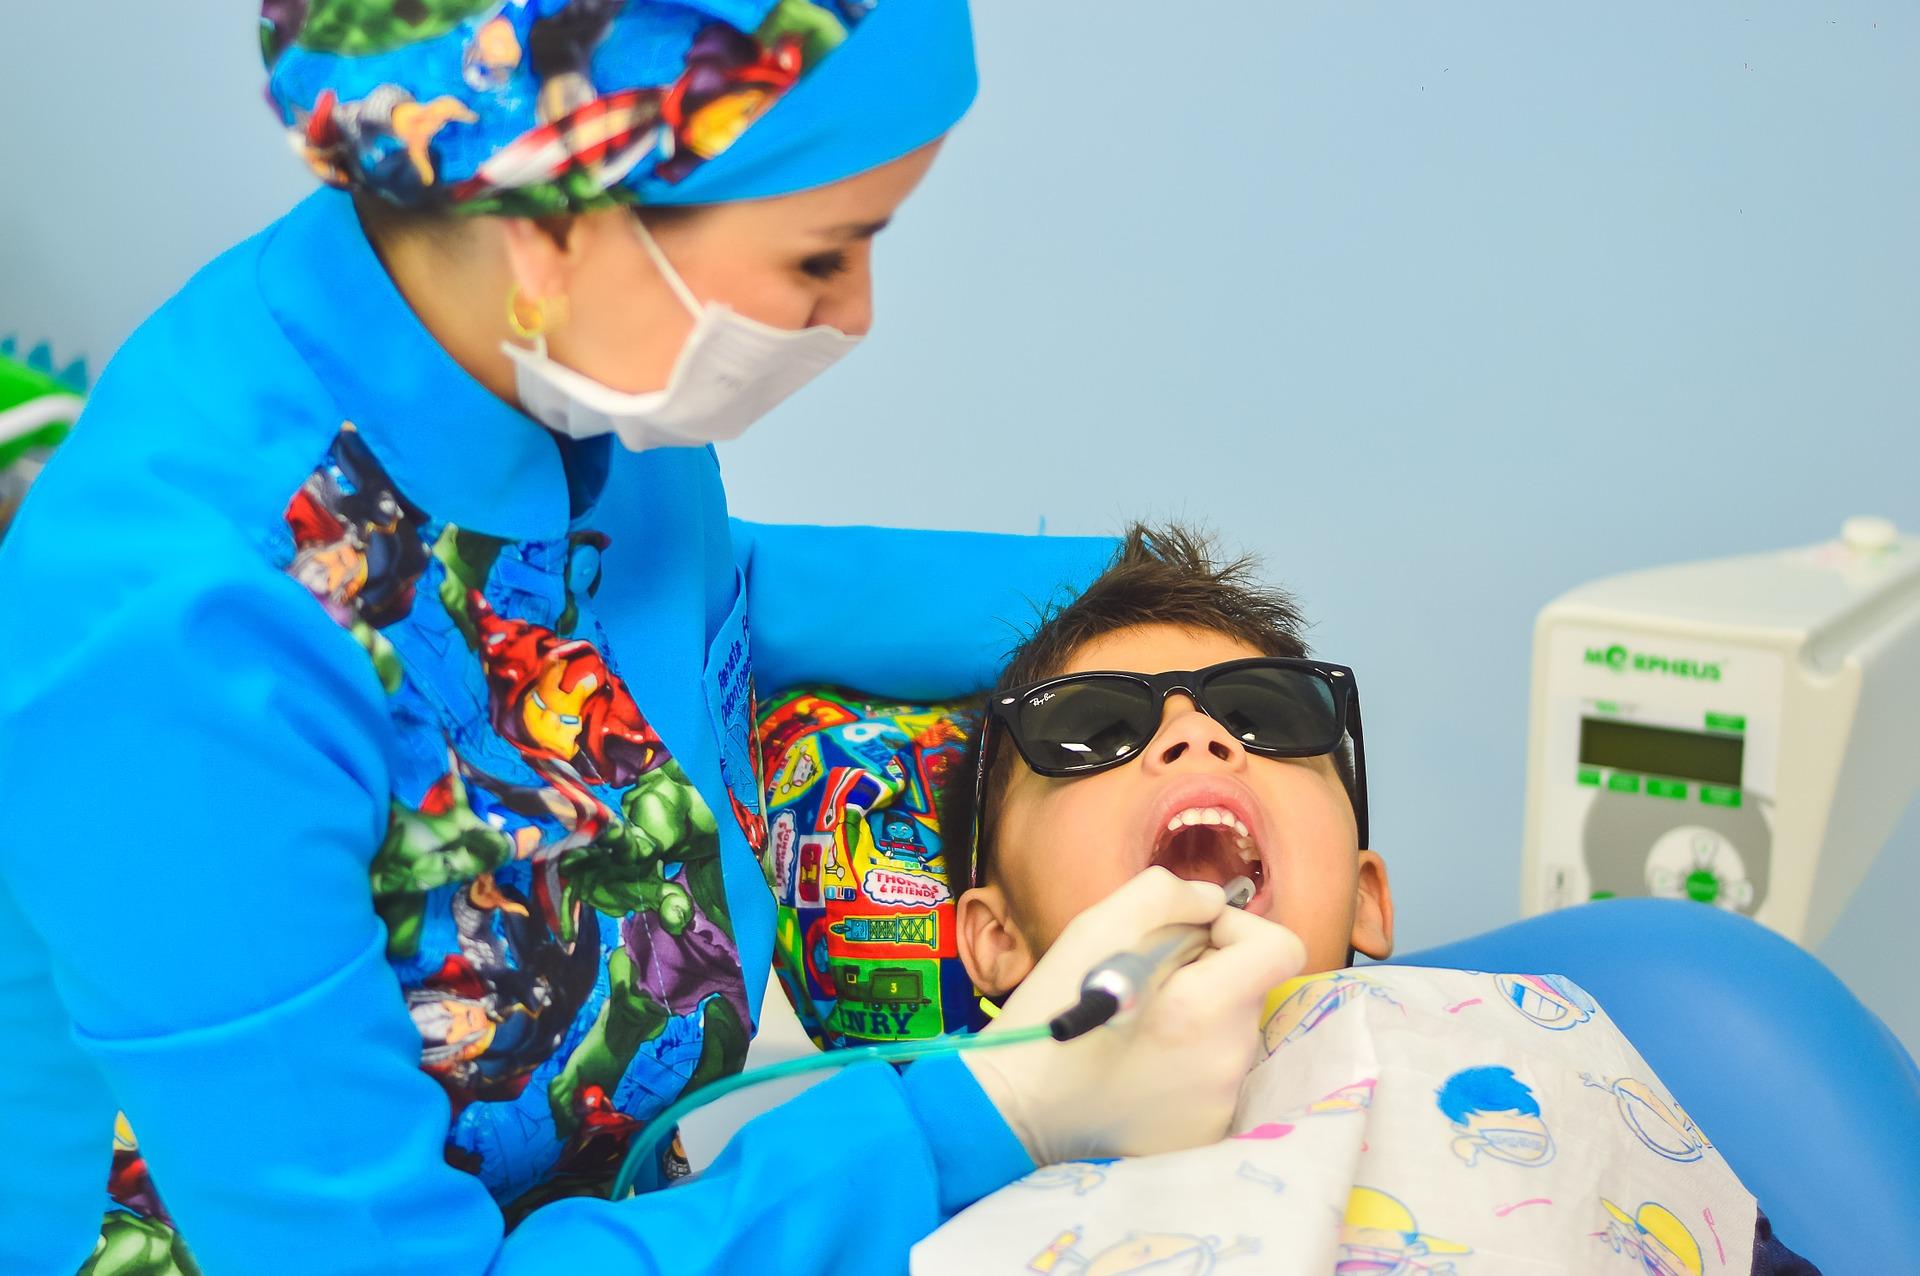 cum-sa-i-faci-pe-micii-pacienti-sa-aiba-o-atitudine-pozitiva-vizavi-de-igiena-dentara